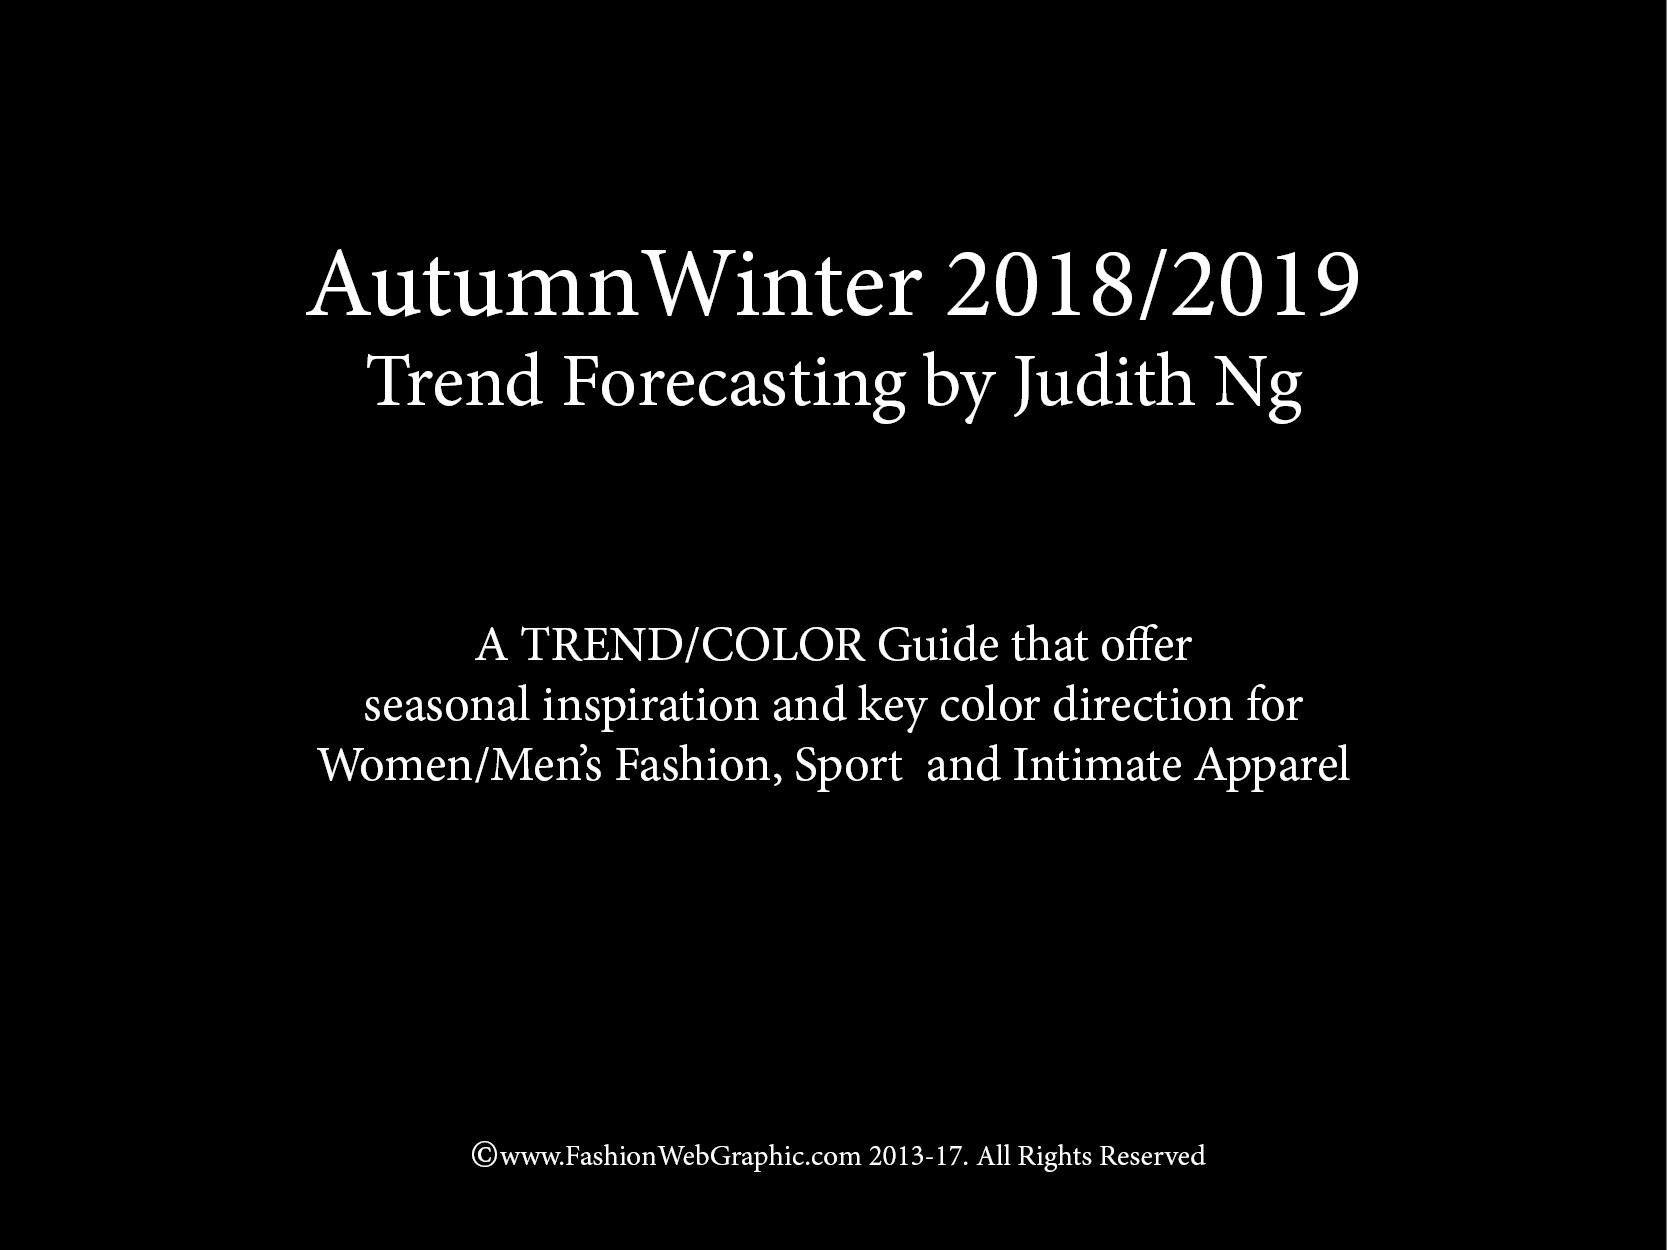 Fashion Web Graphic Design And Development Fashionwebgraphic Gmail